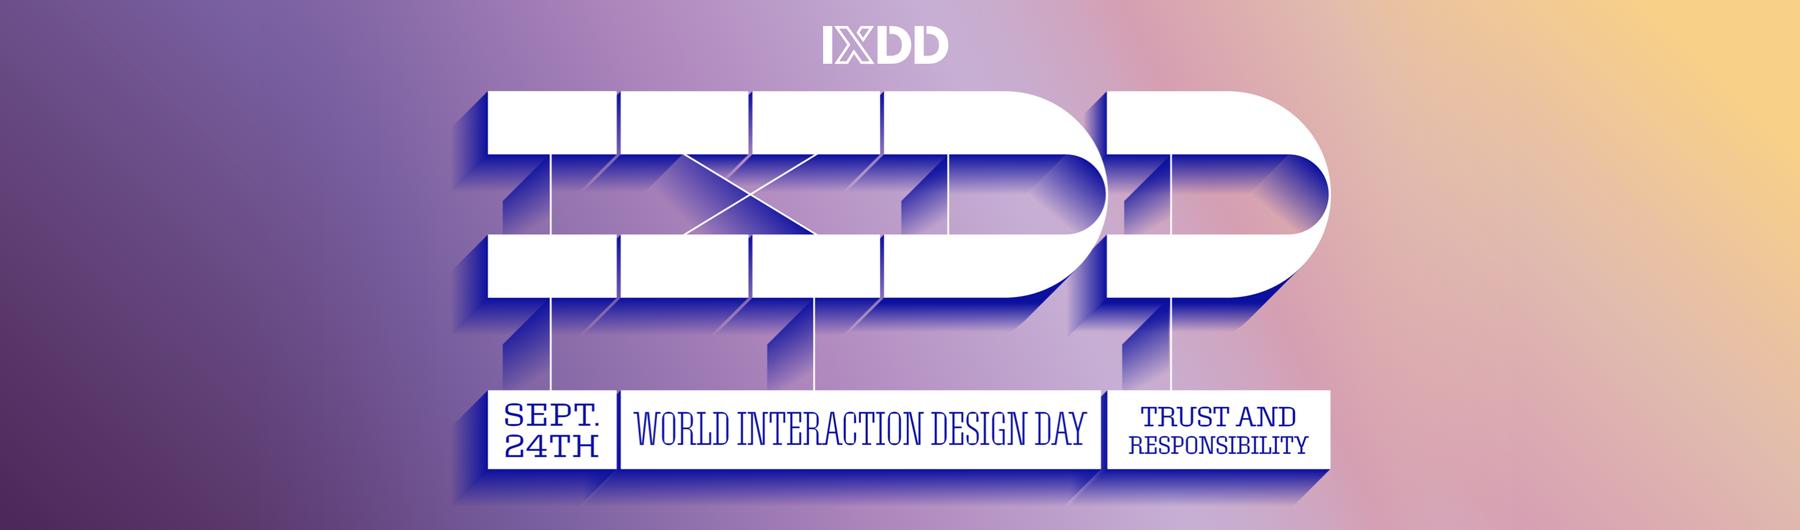 World Interaction Design Day 2019